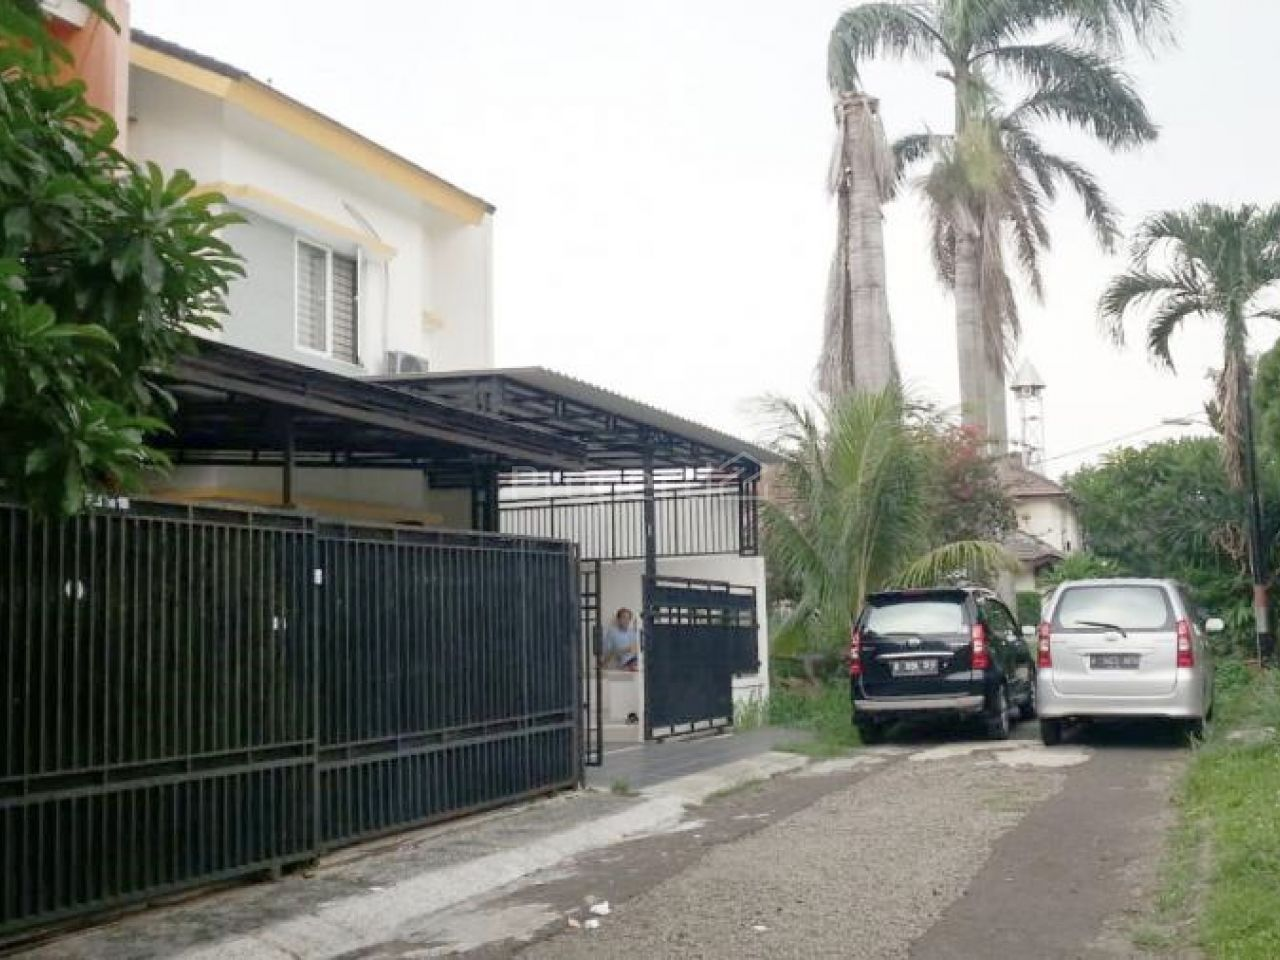 2-Storey House at Griya Loka BSD, Banten